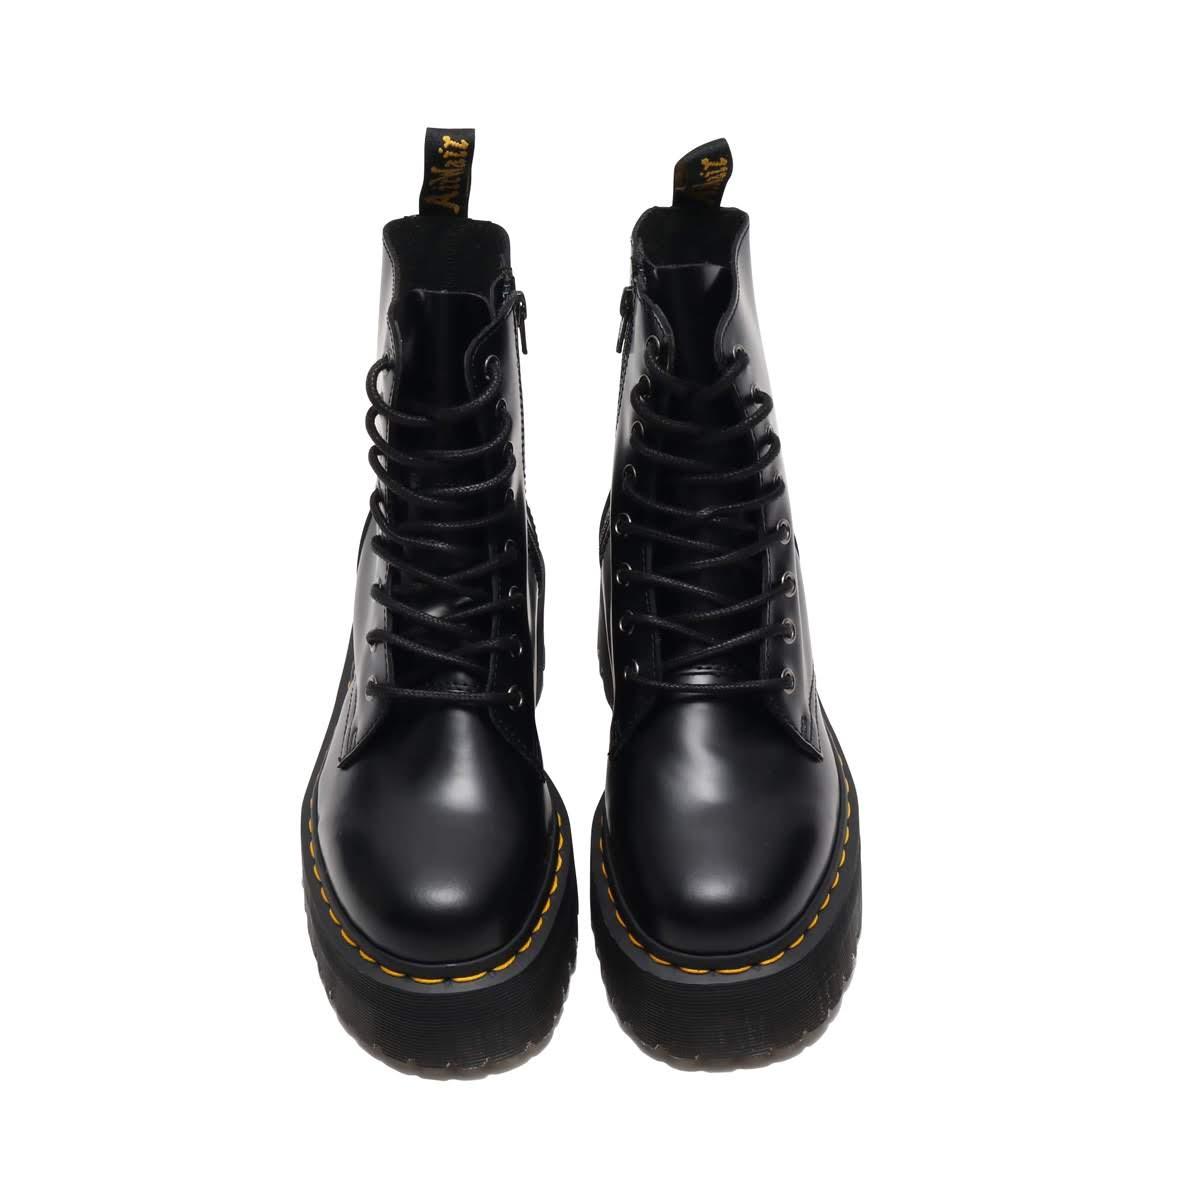 f2d0133e3bbce Dr.Martens QUAD RETRO JADON 8 EYE BOOT (doctor Martin quad nostalgic Jeh  Don 8 eye boots) BLACK 16FW-I